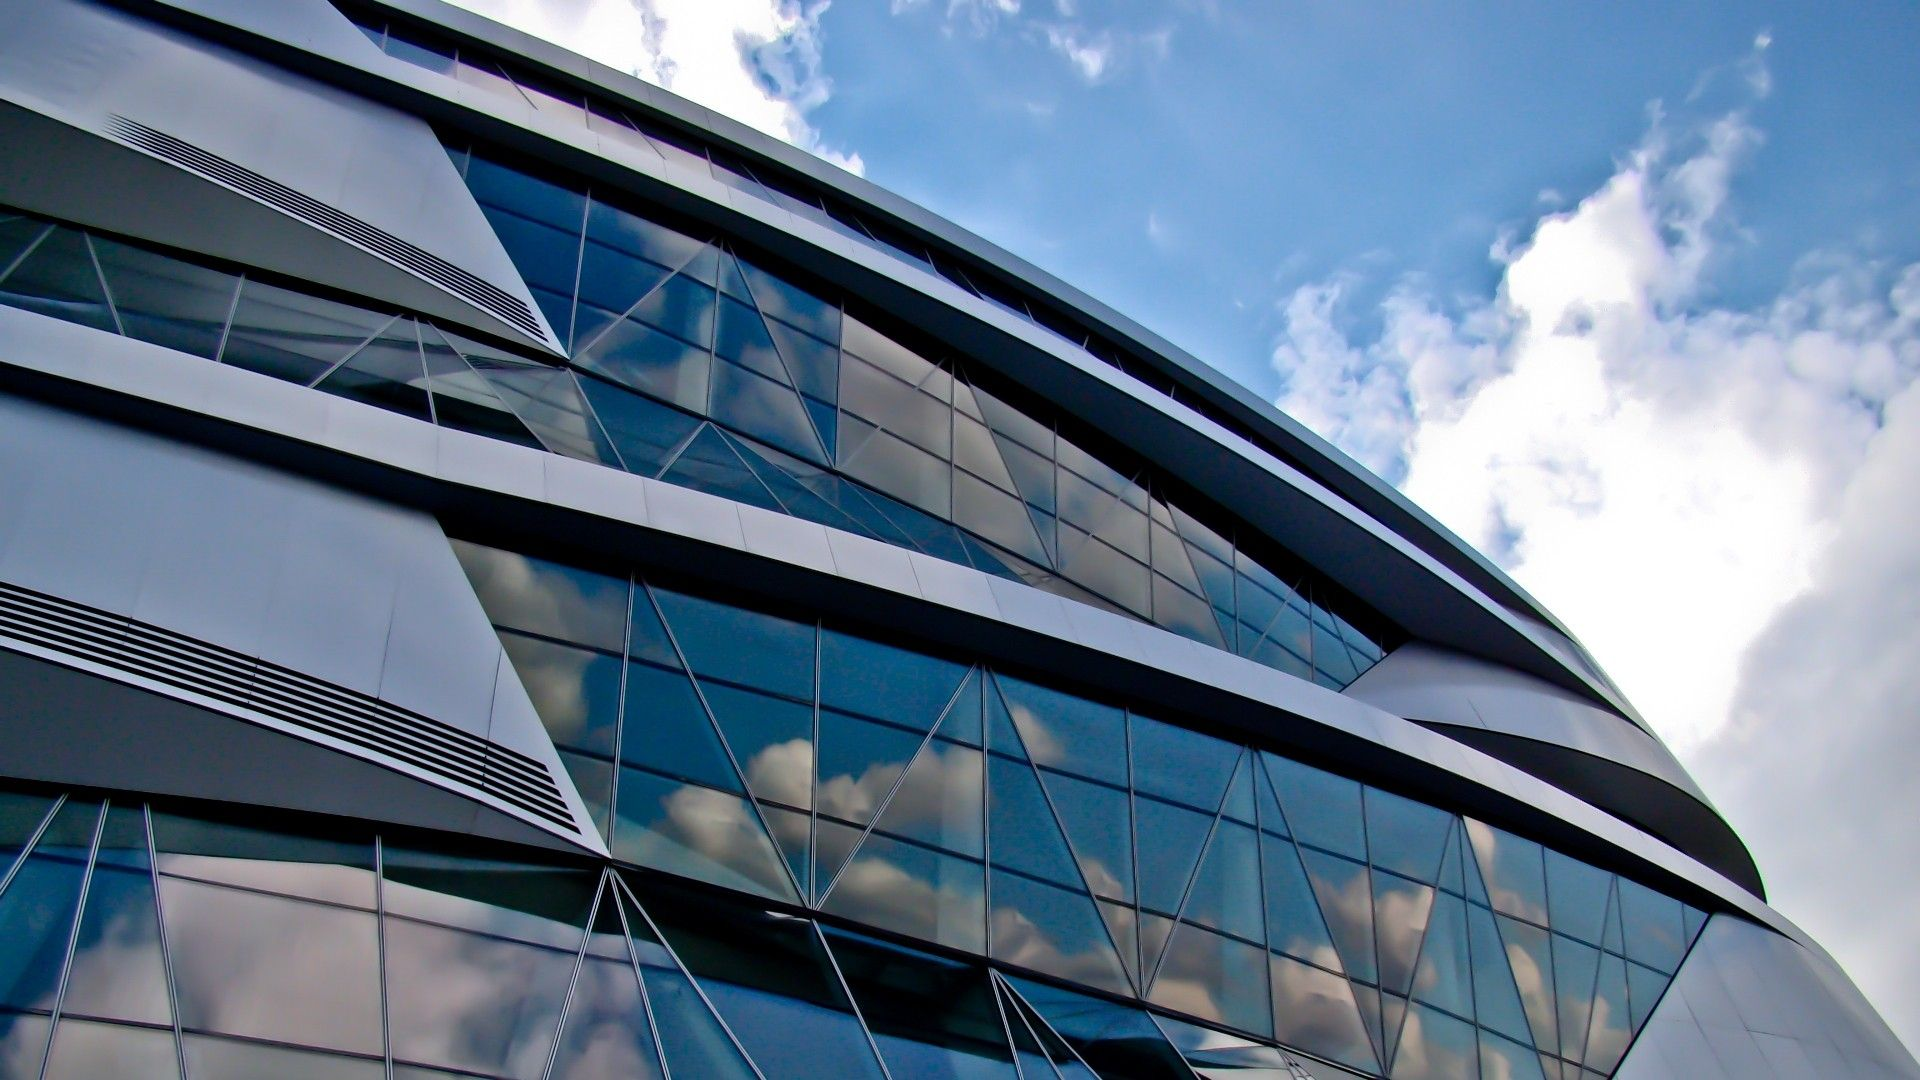 Glass Building Architecture #Glass Pinned By Www.modlar.com